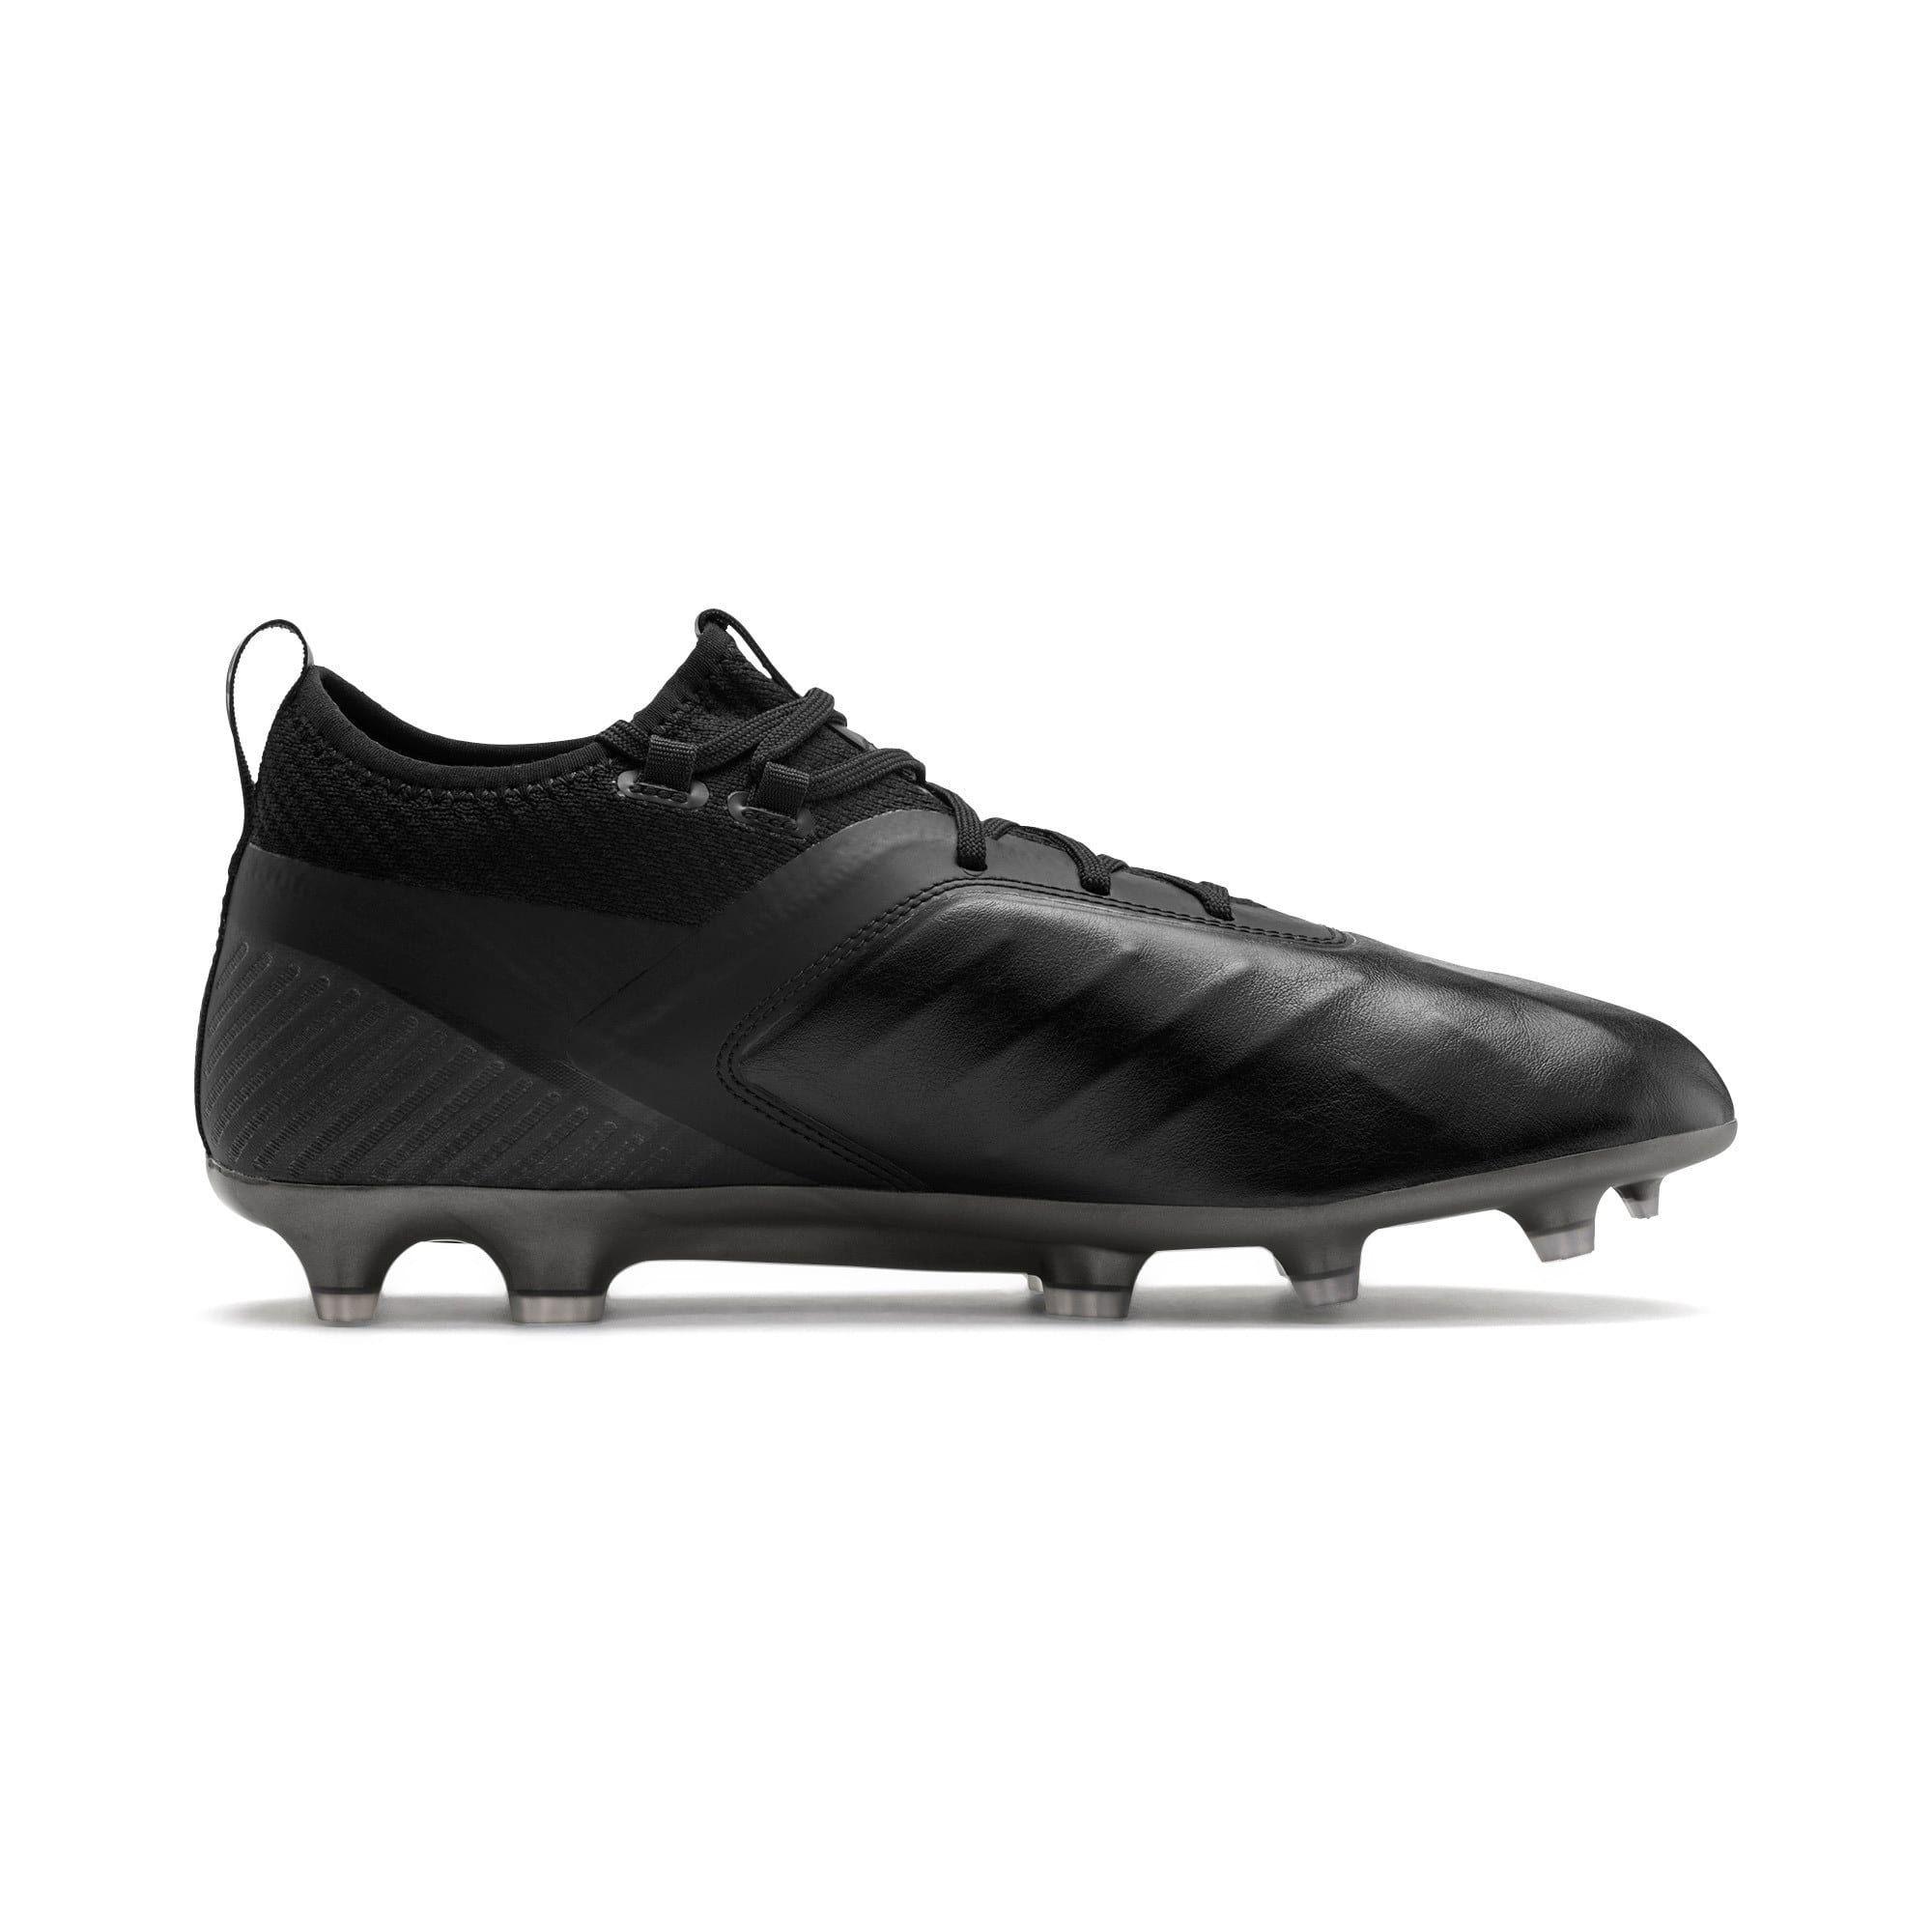 chaussures de foot puma homme